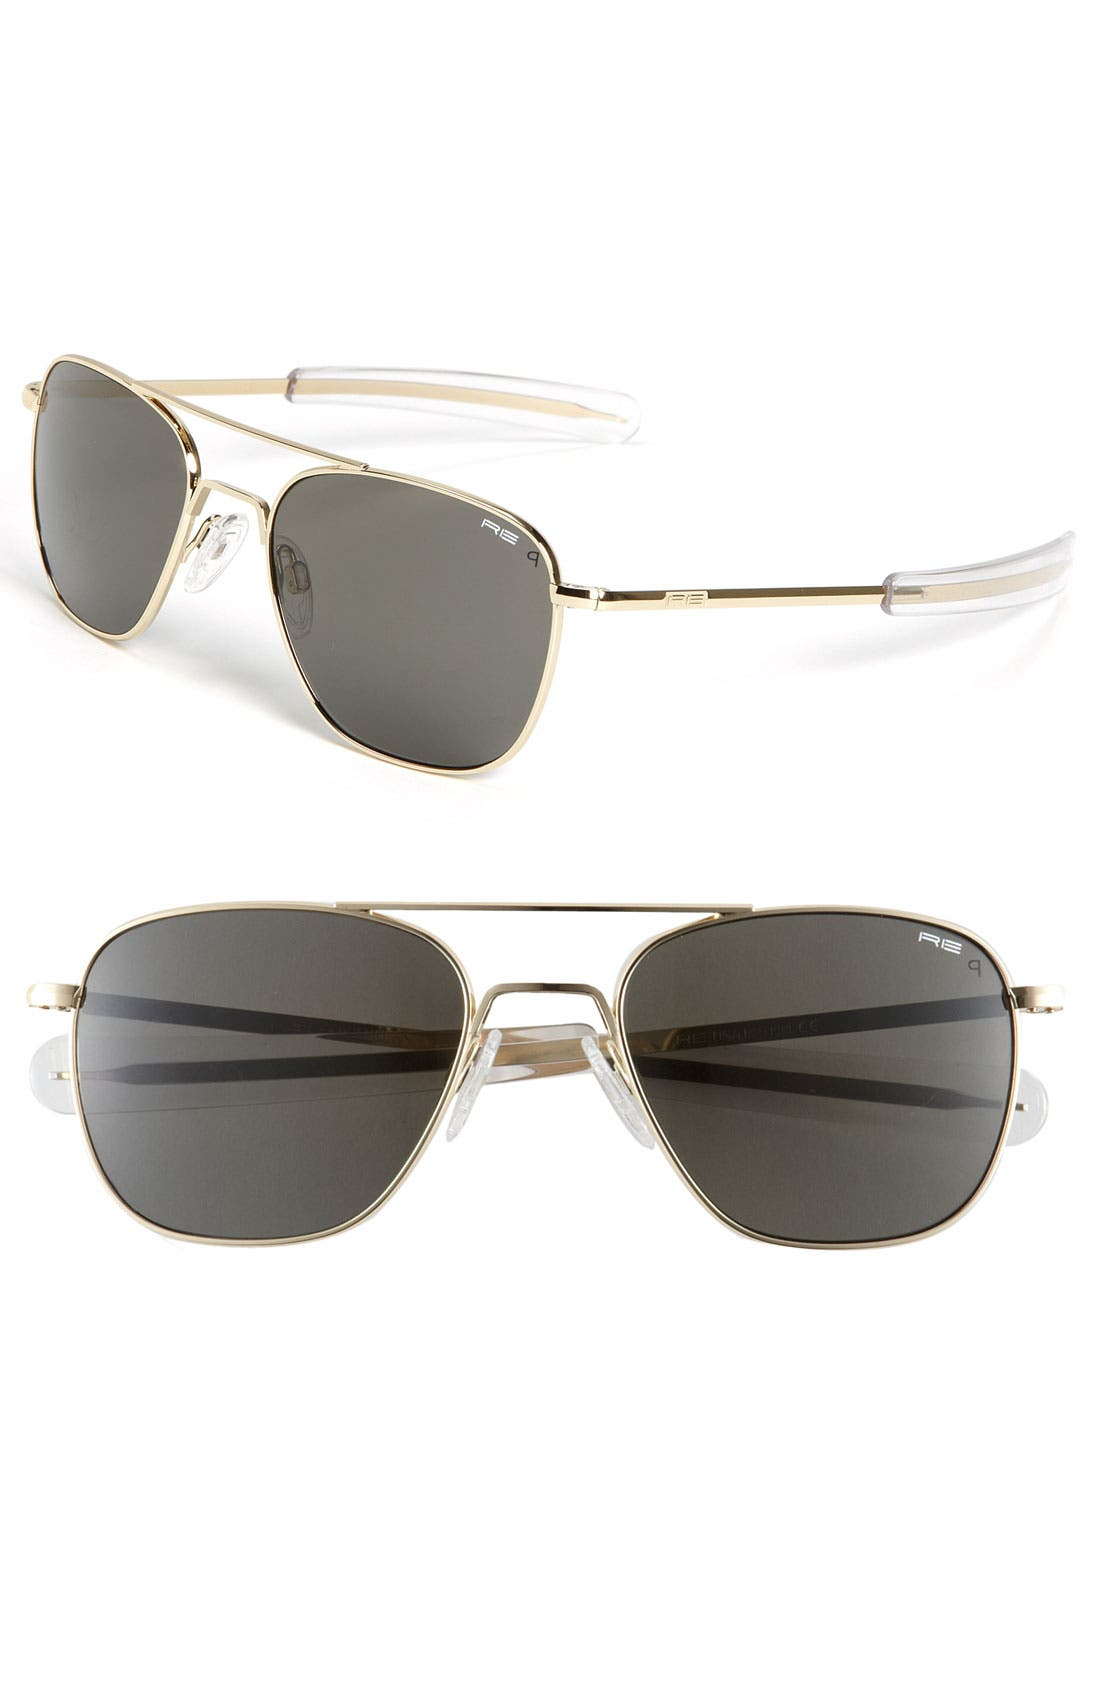 Main Image - Randolph Engineering 'Signature' Polarized Aviator 55mm Sunglasses